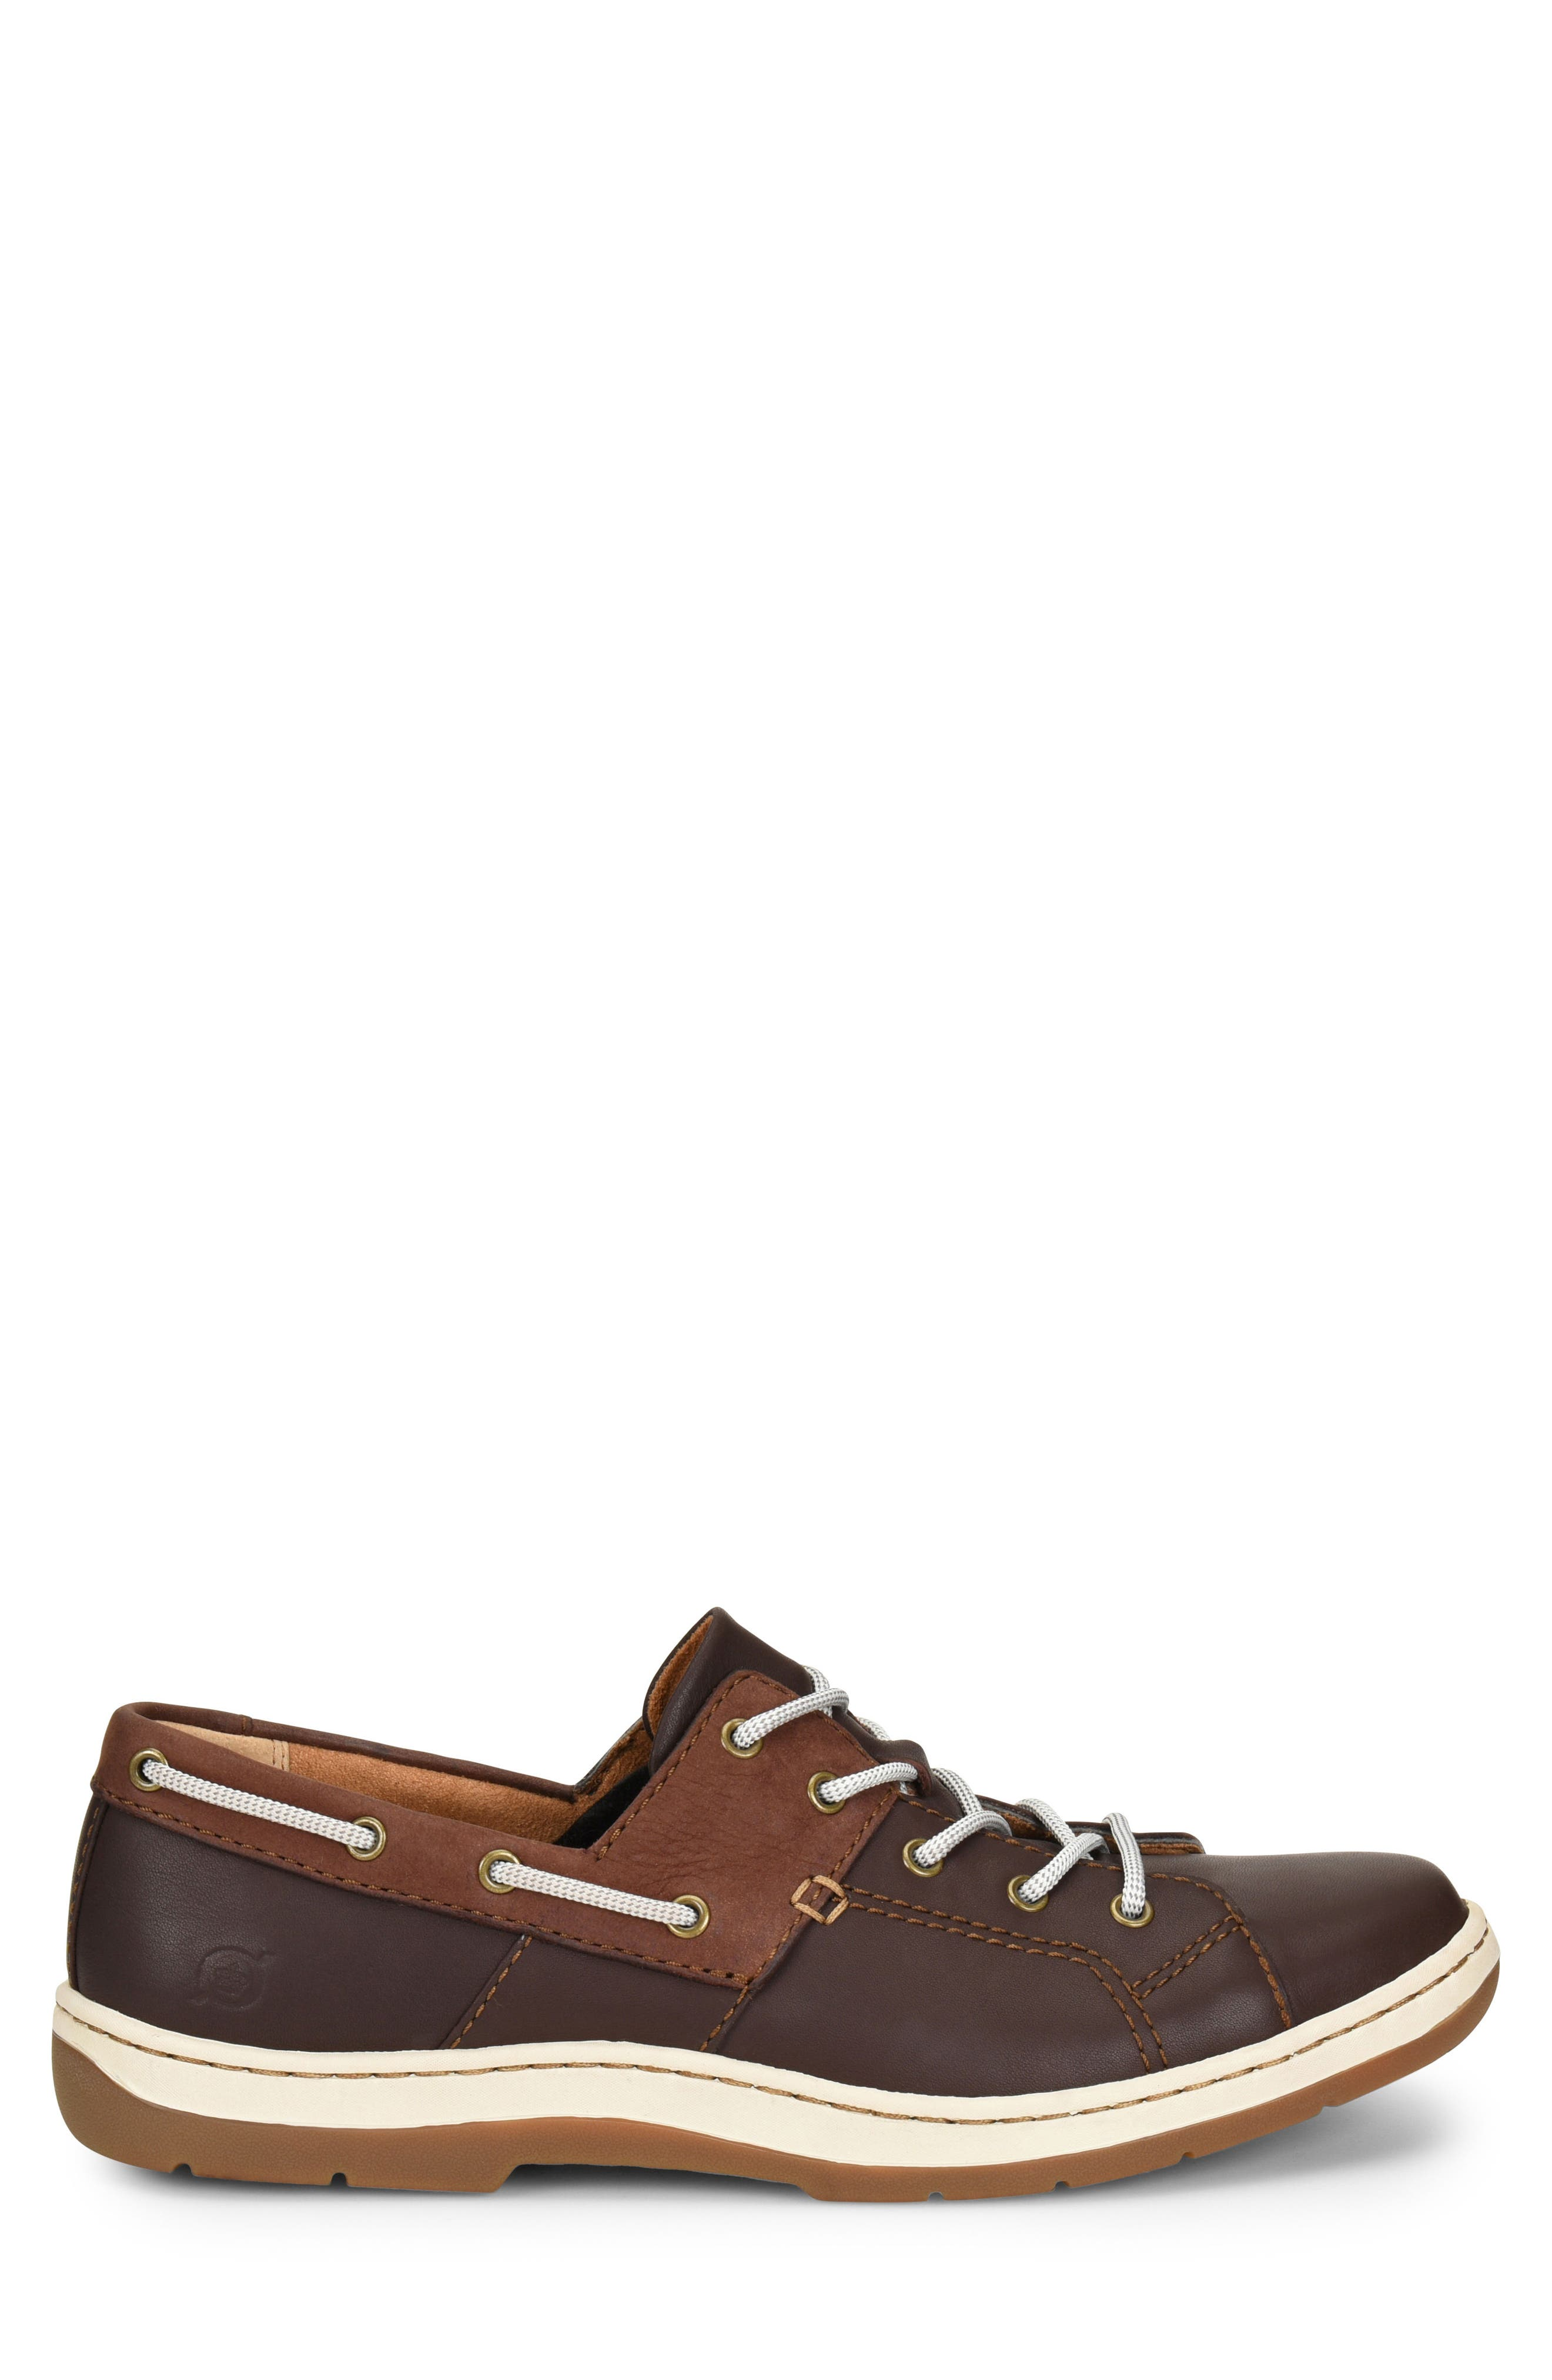 Marius Boat Shoe Sneaker,                             Alternate thumbnail 3, color,                             205